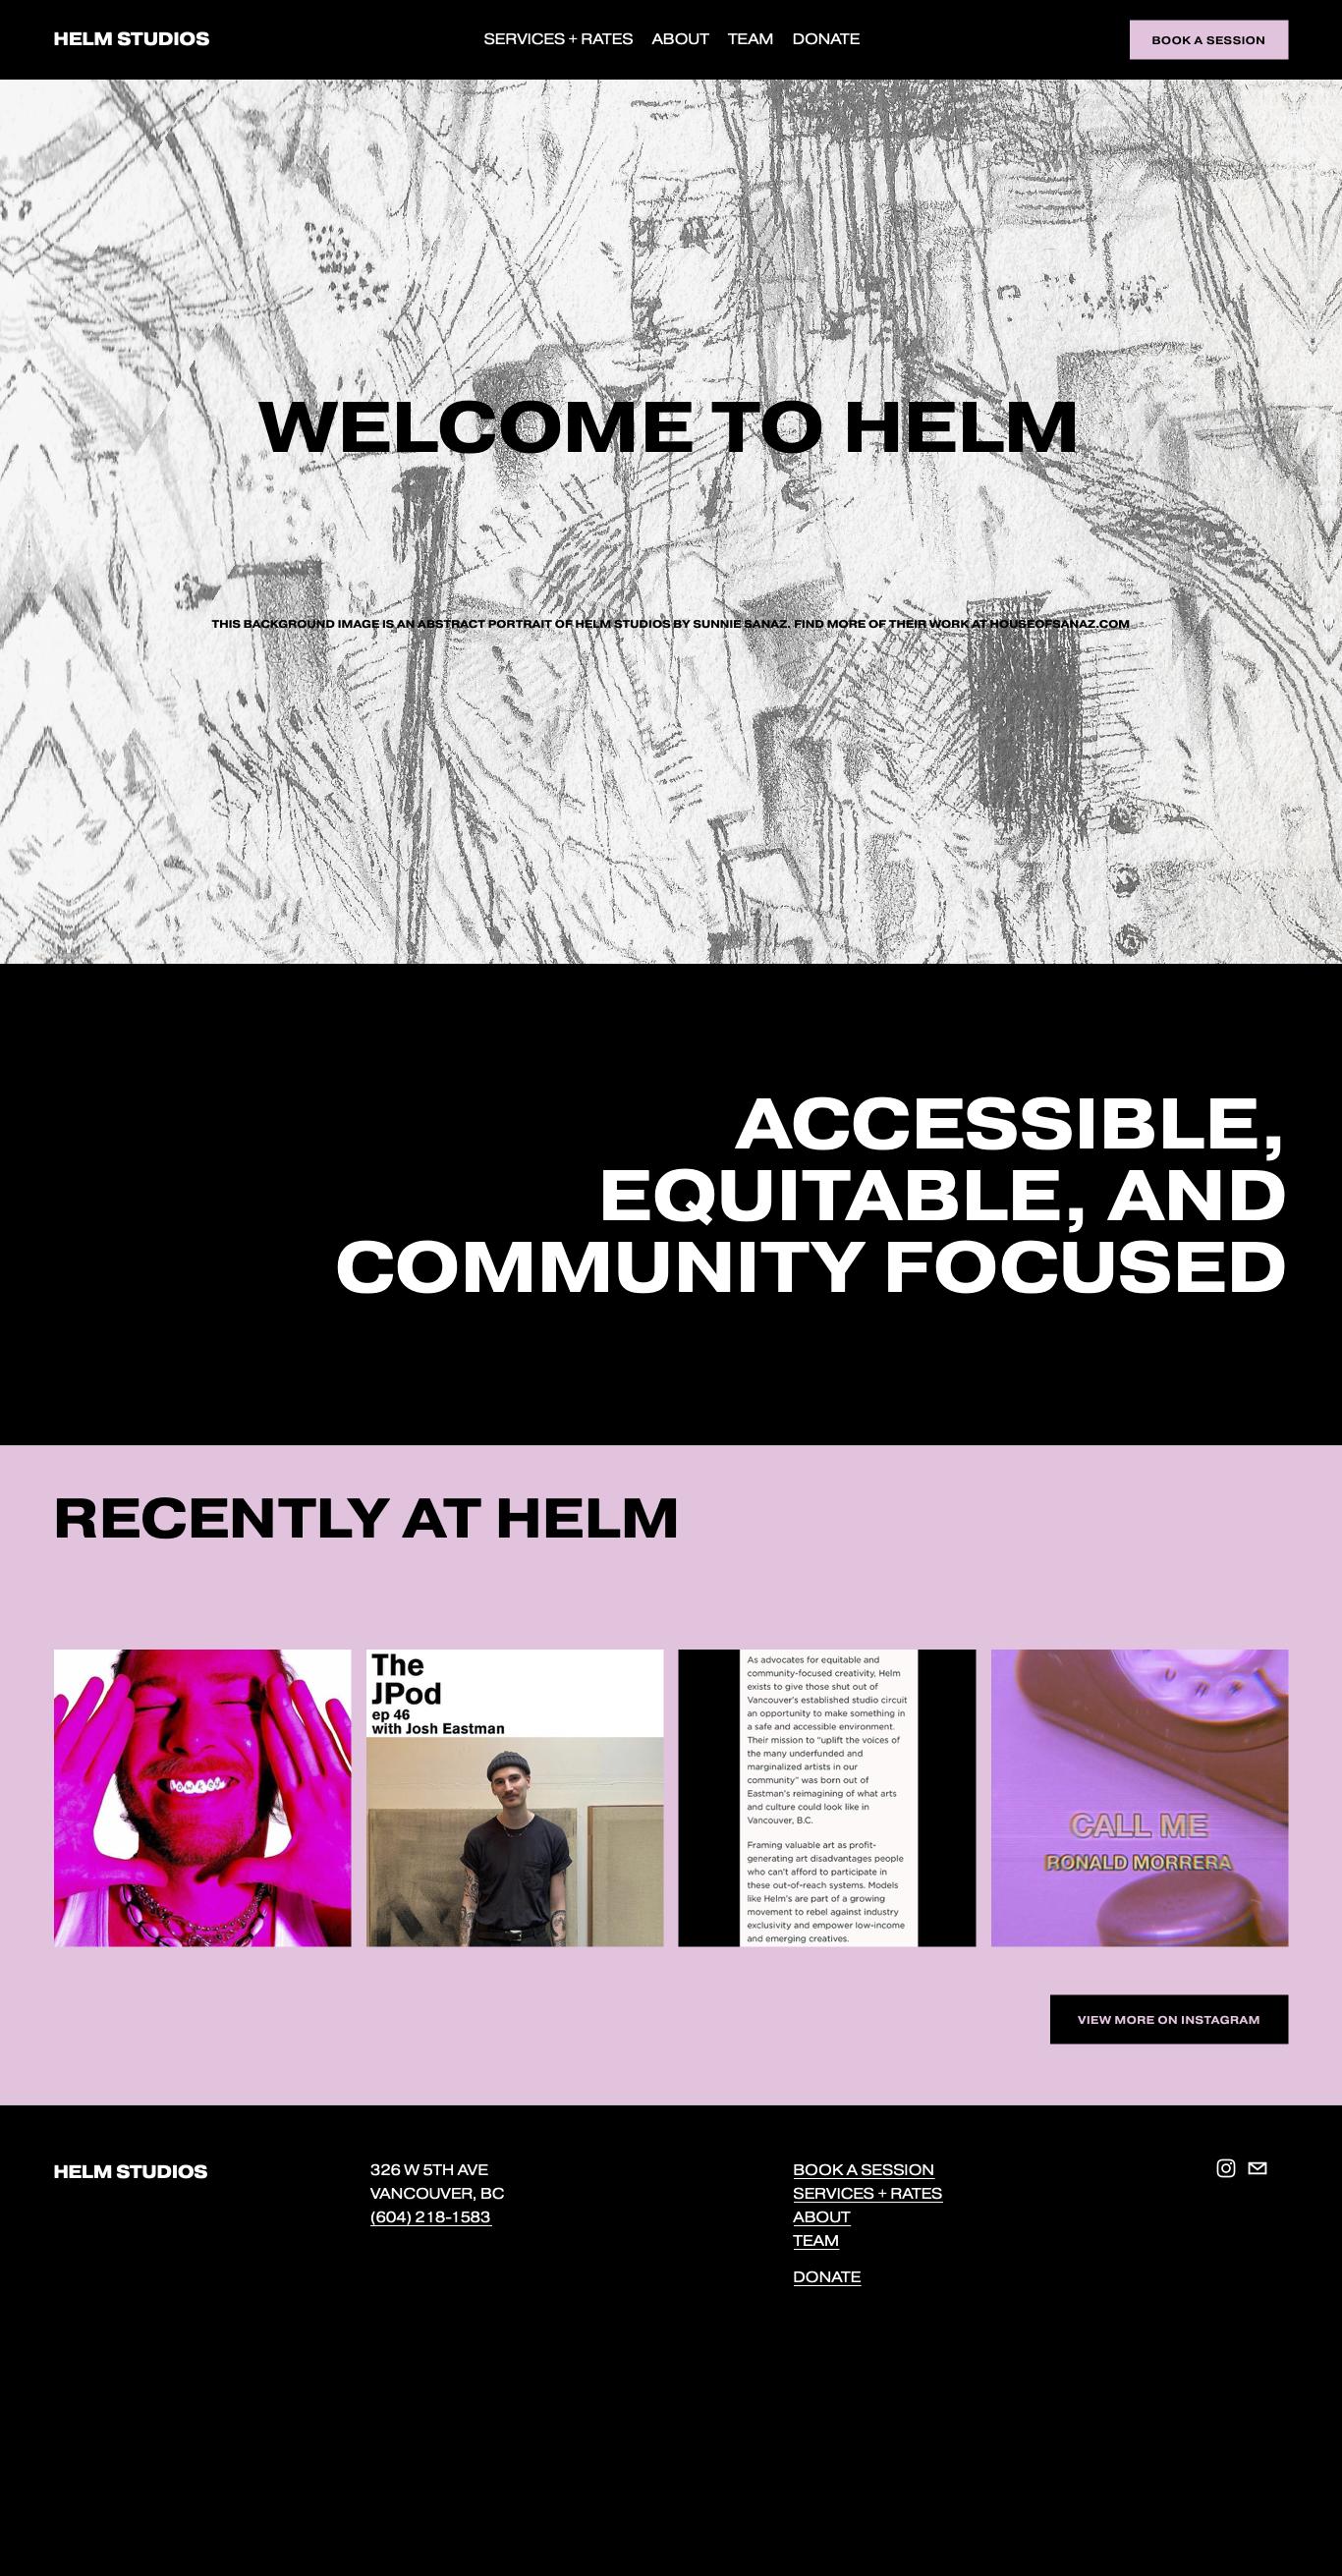 http://www.helmstudios.org